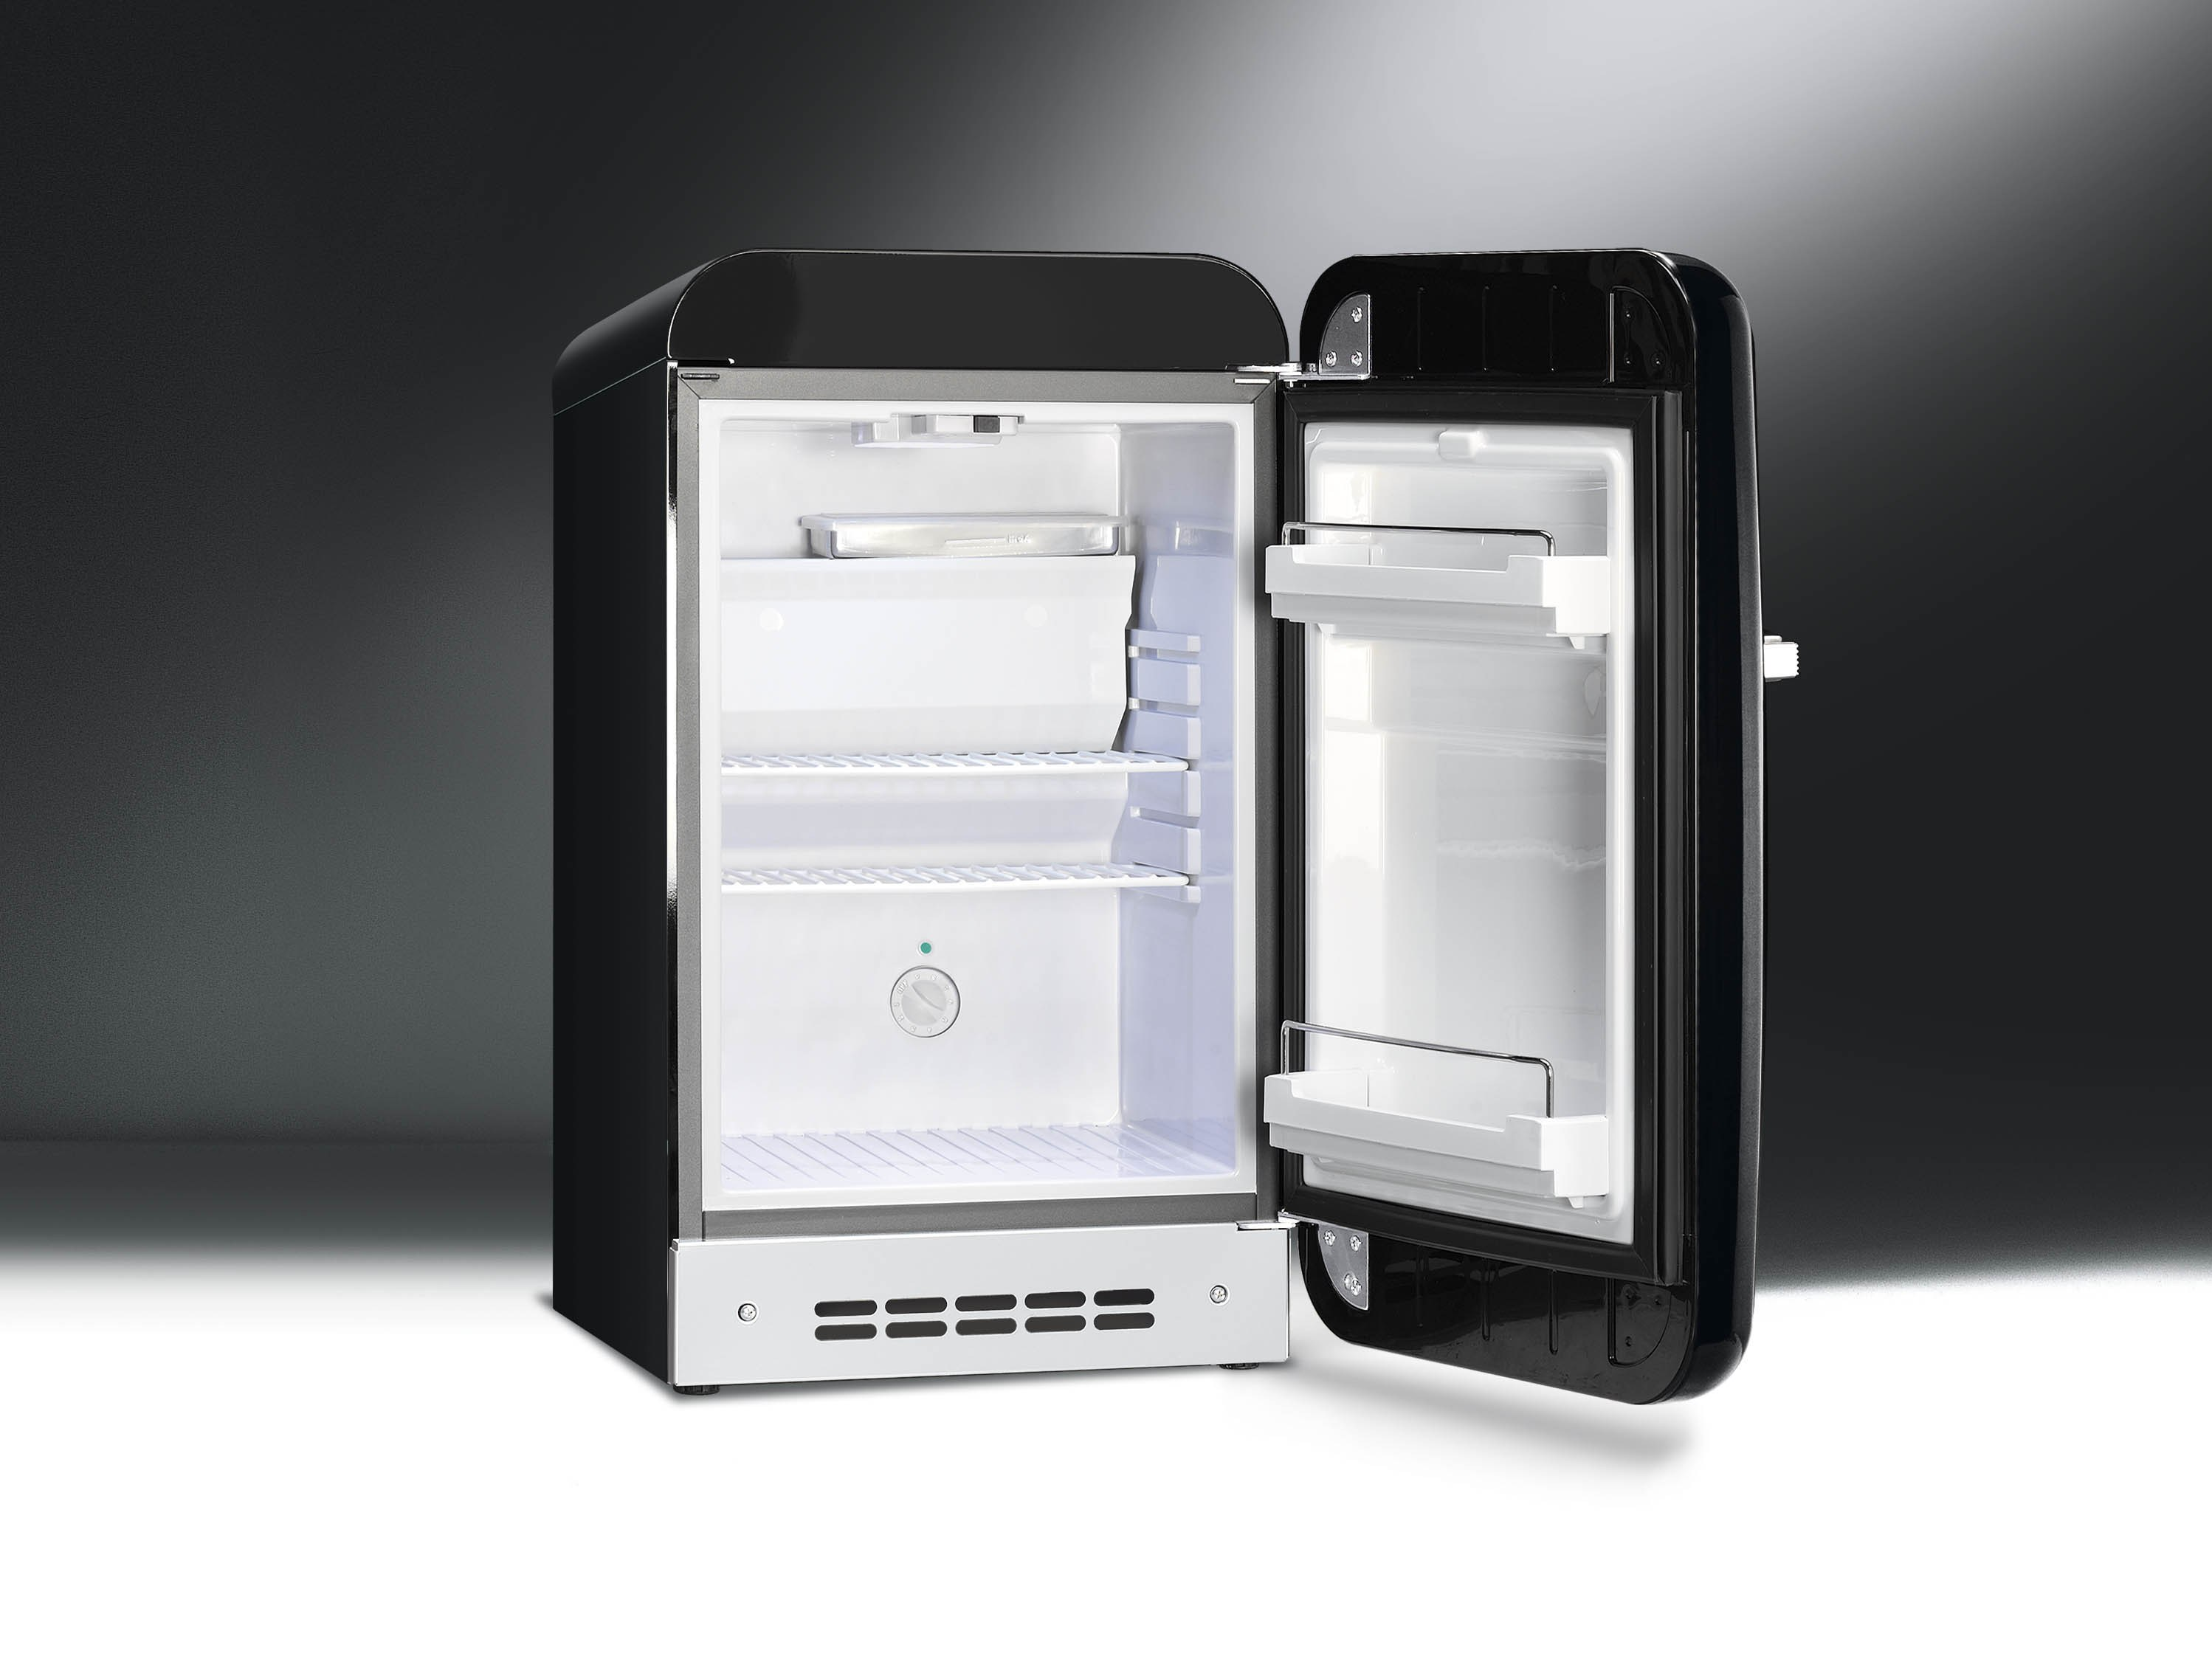 Minibar Kühlschrank Retro : Minibar kühlschrank retro mini kühlschrank günstig kaufen